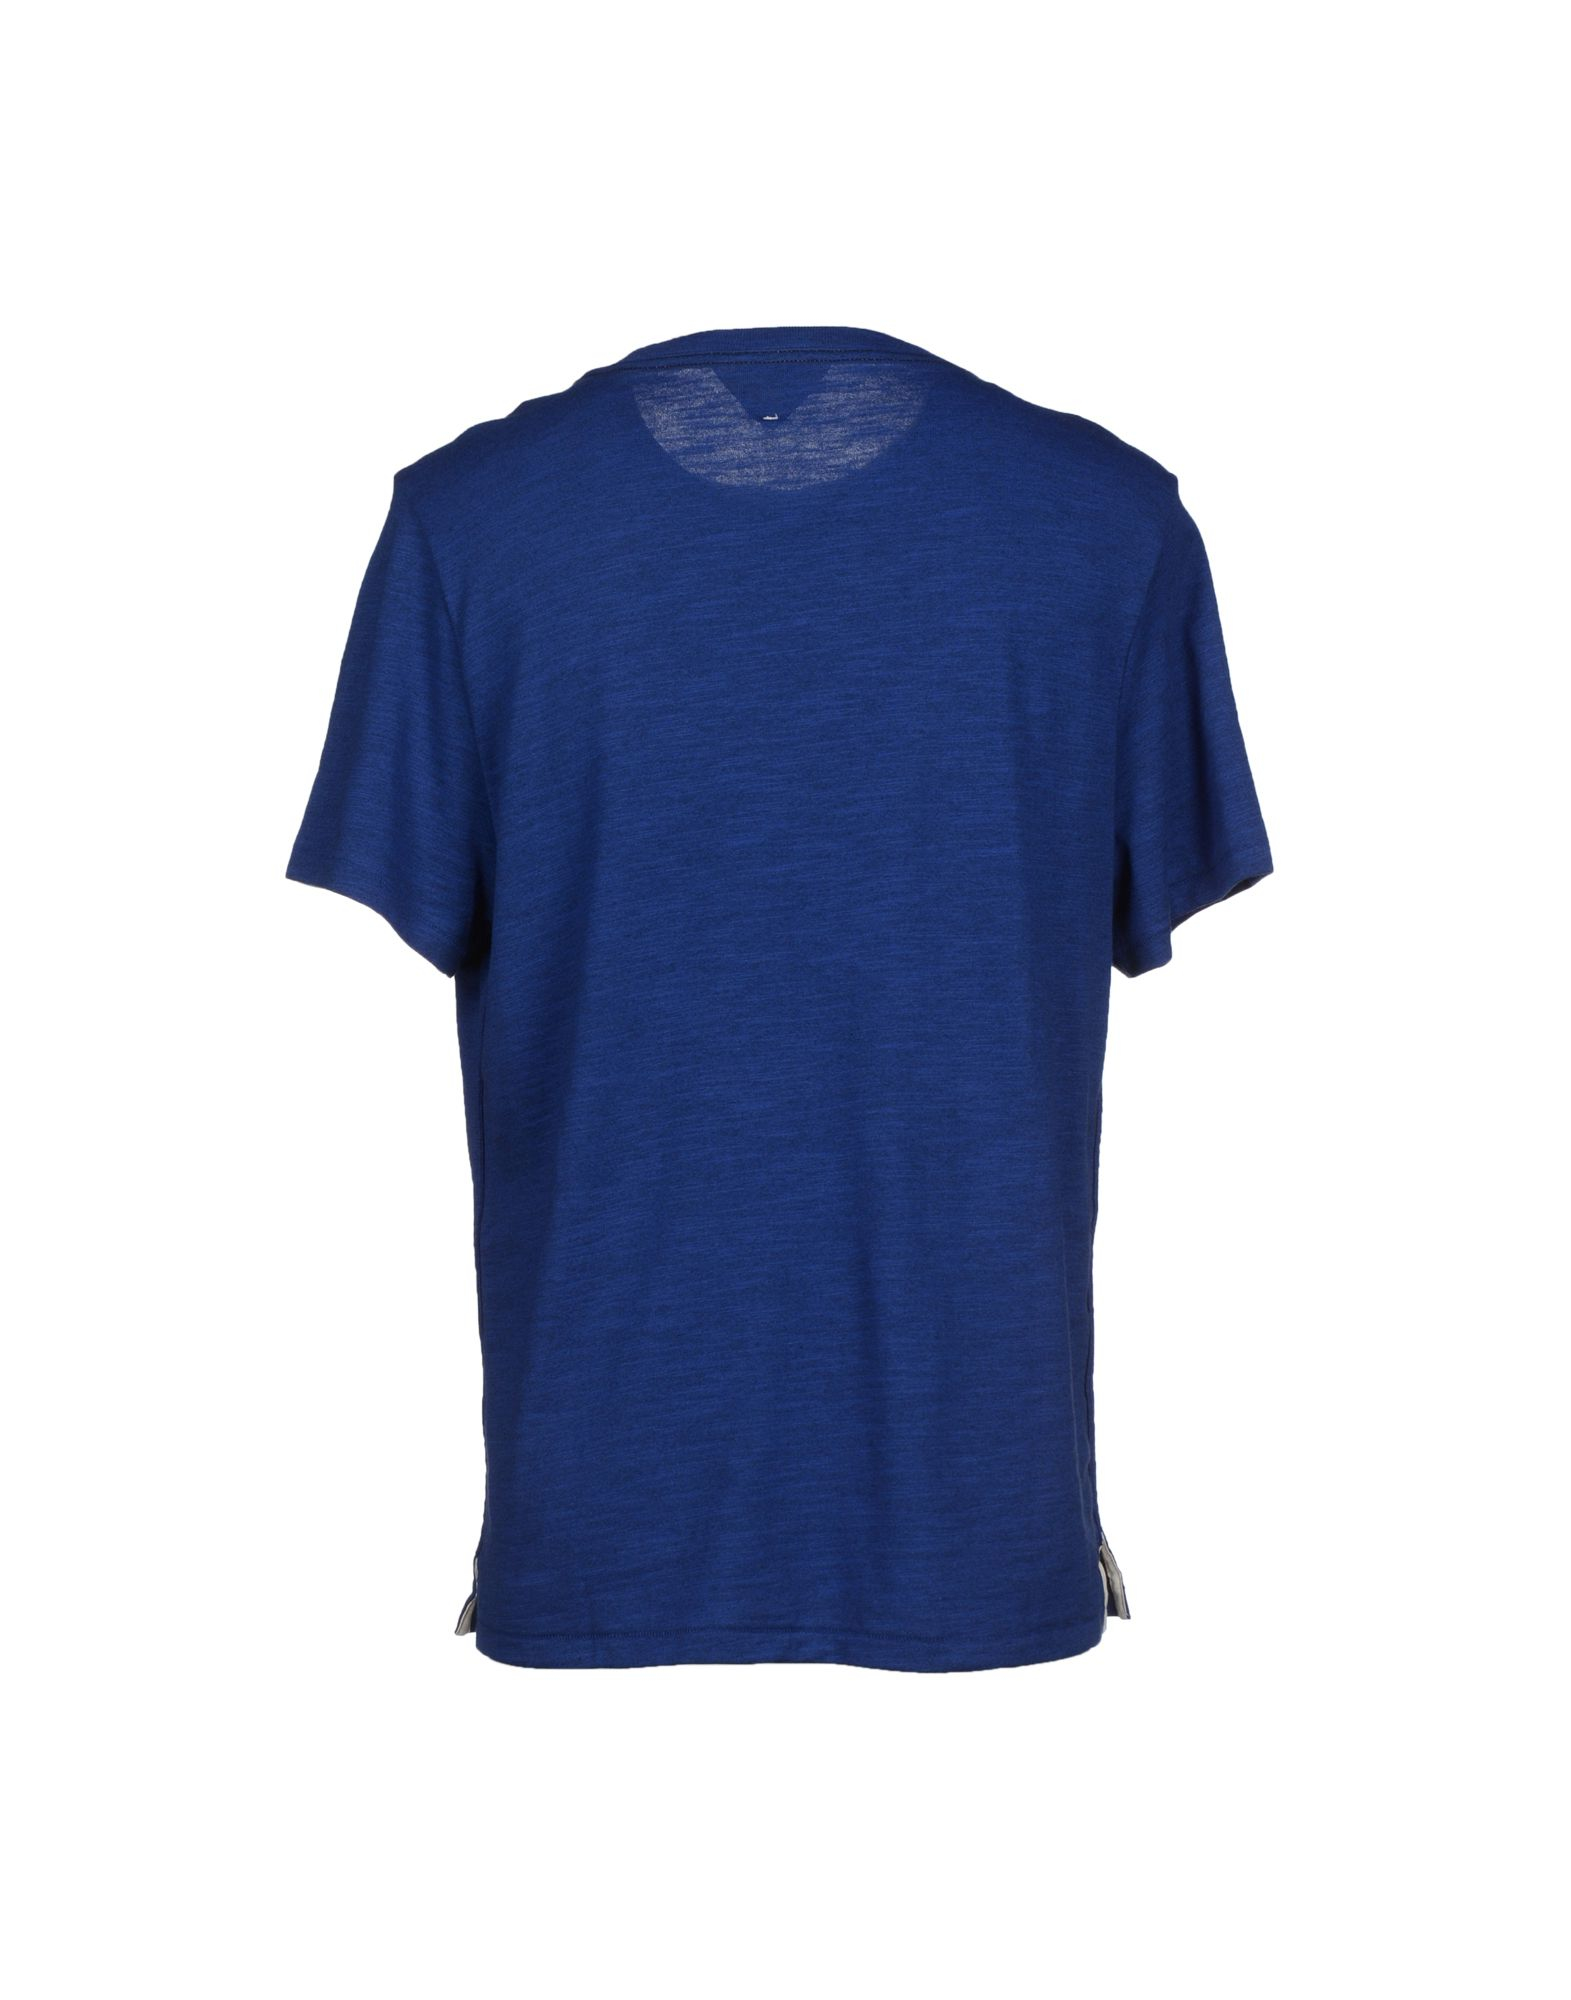 Rag bone t shirt in blue for men lyst for Rag and bone t shirts